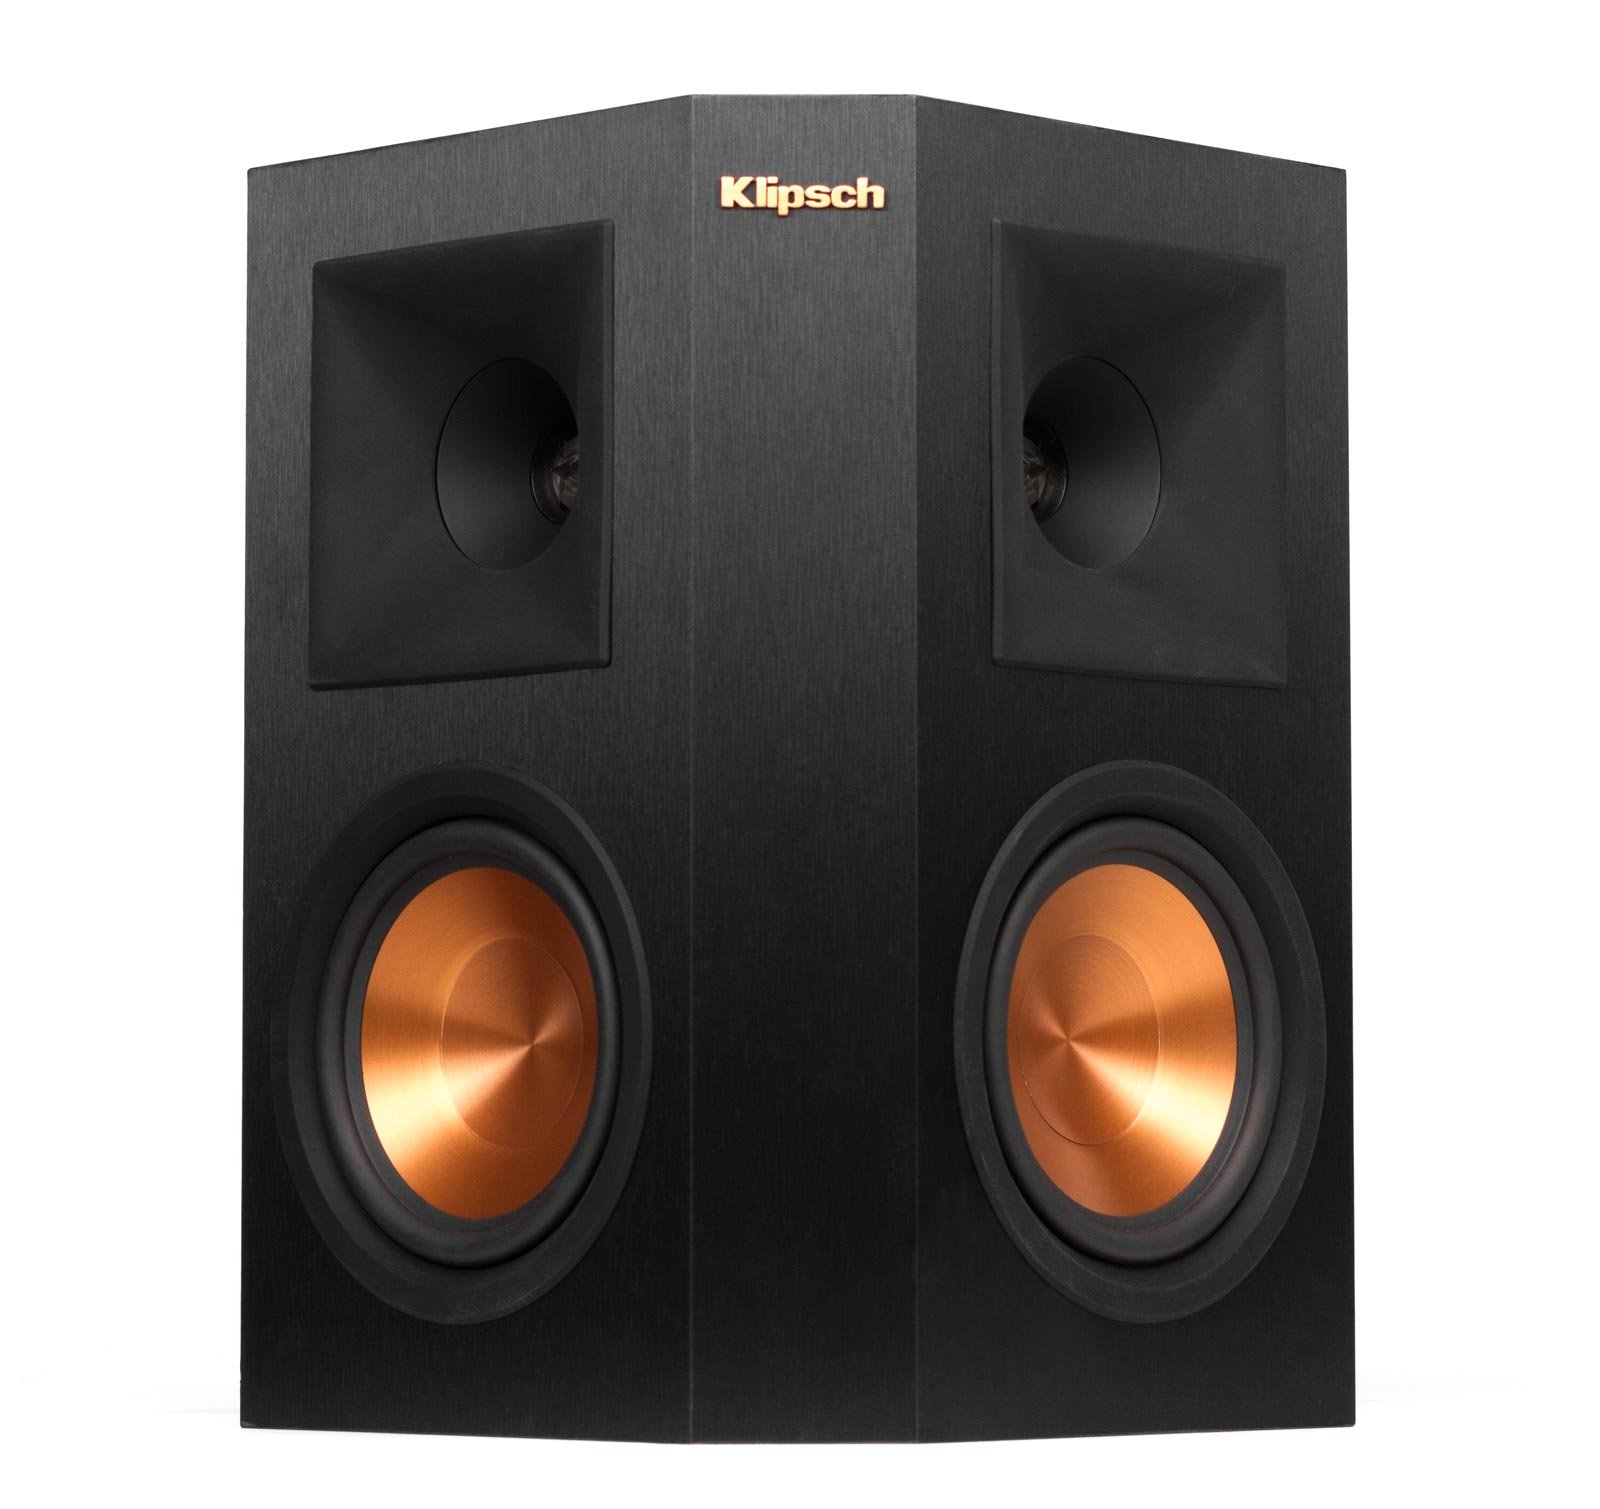 Klipsch RP-250S Reference Premiere Surround Speaker - Ebony, Single (Certified Refurbished)